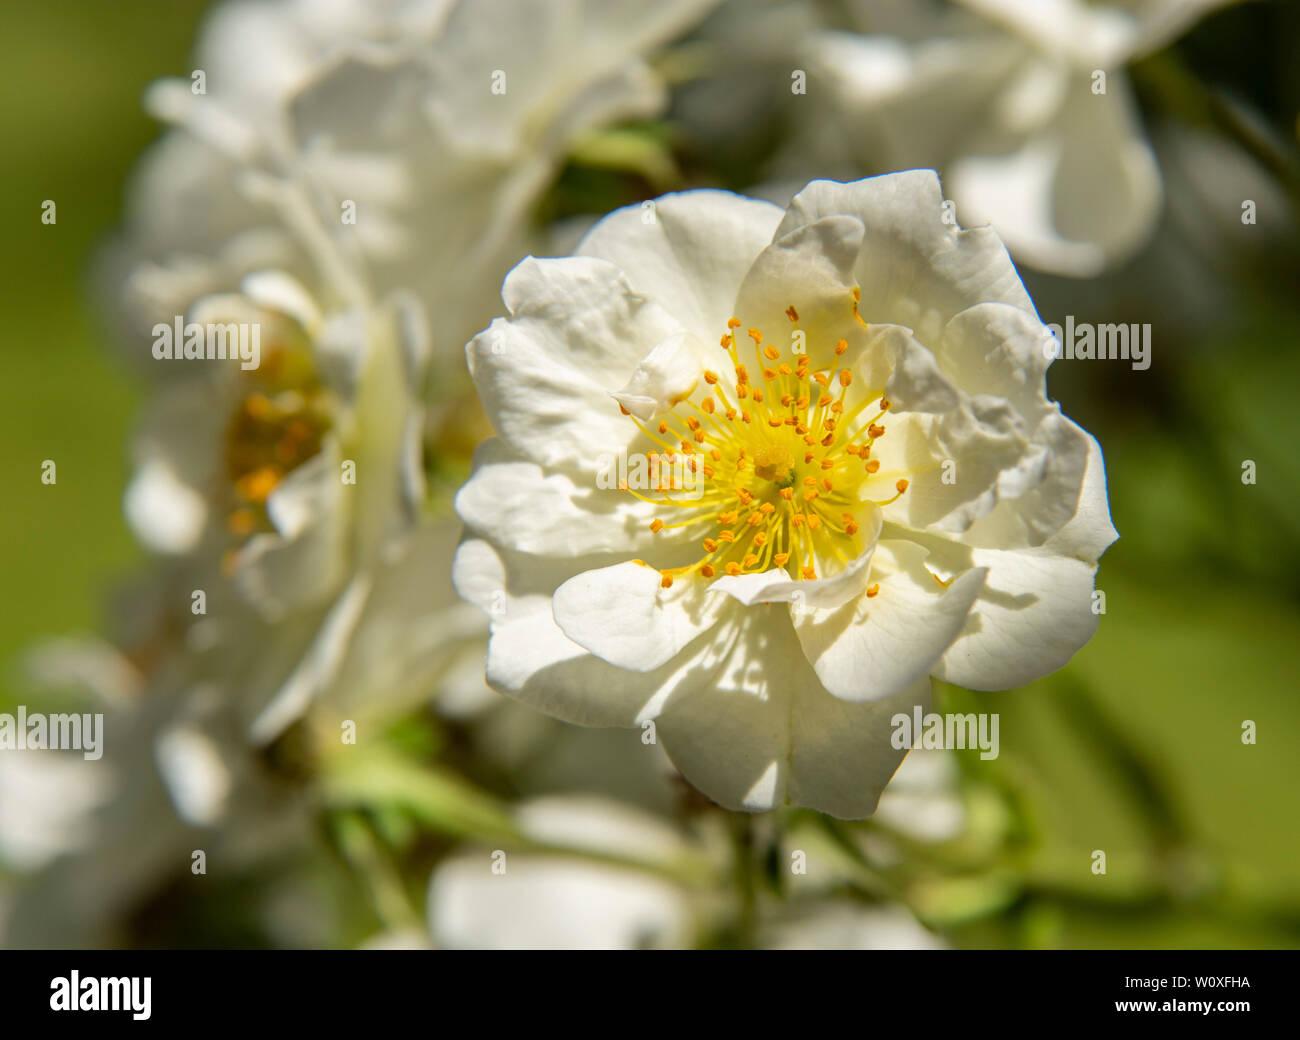 Rambling Rector, a vigorous white rambling rose in flower on a garden arch. - Stock Image